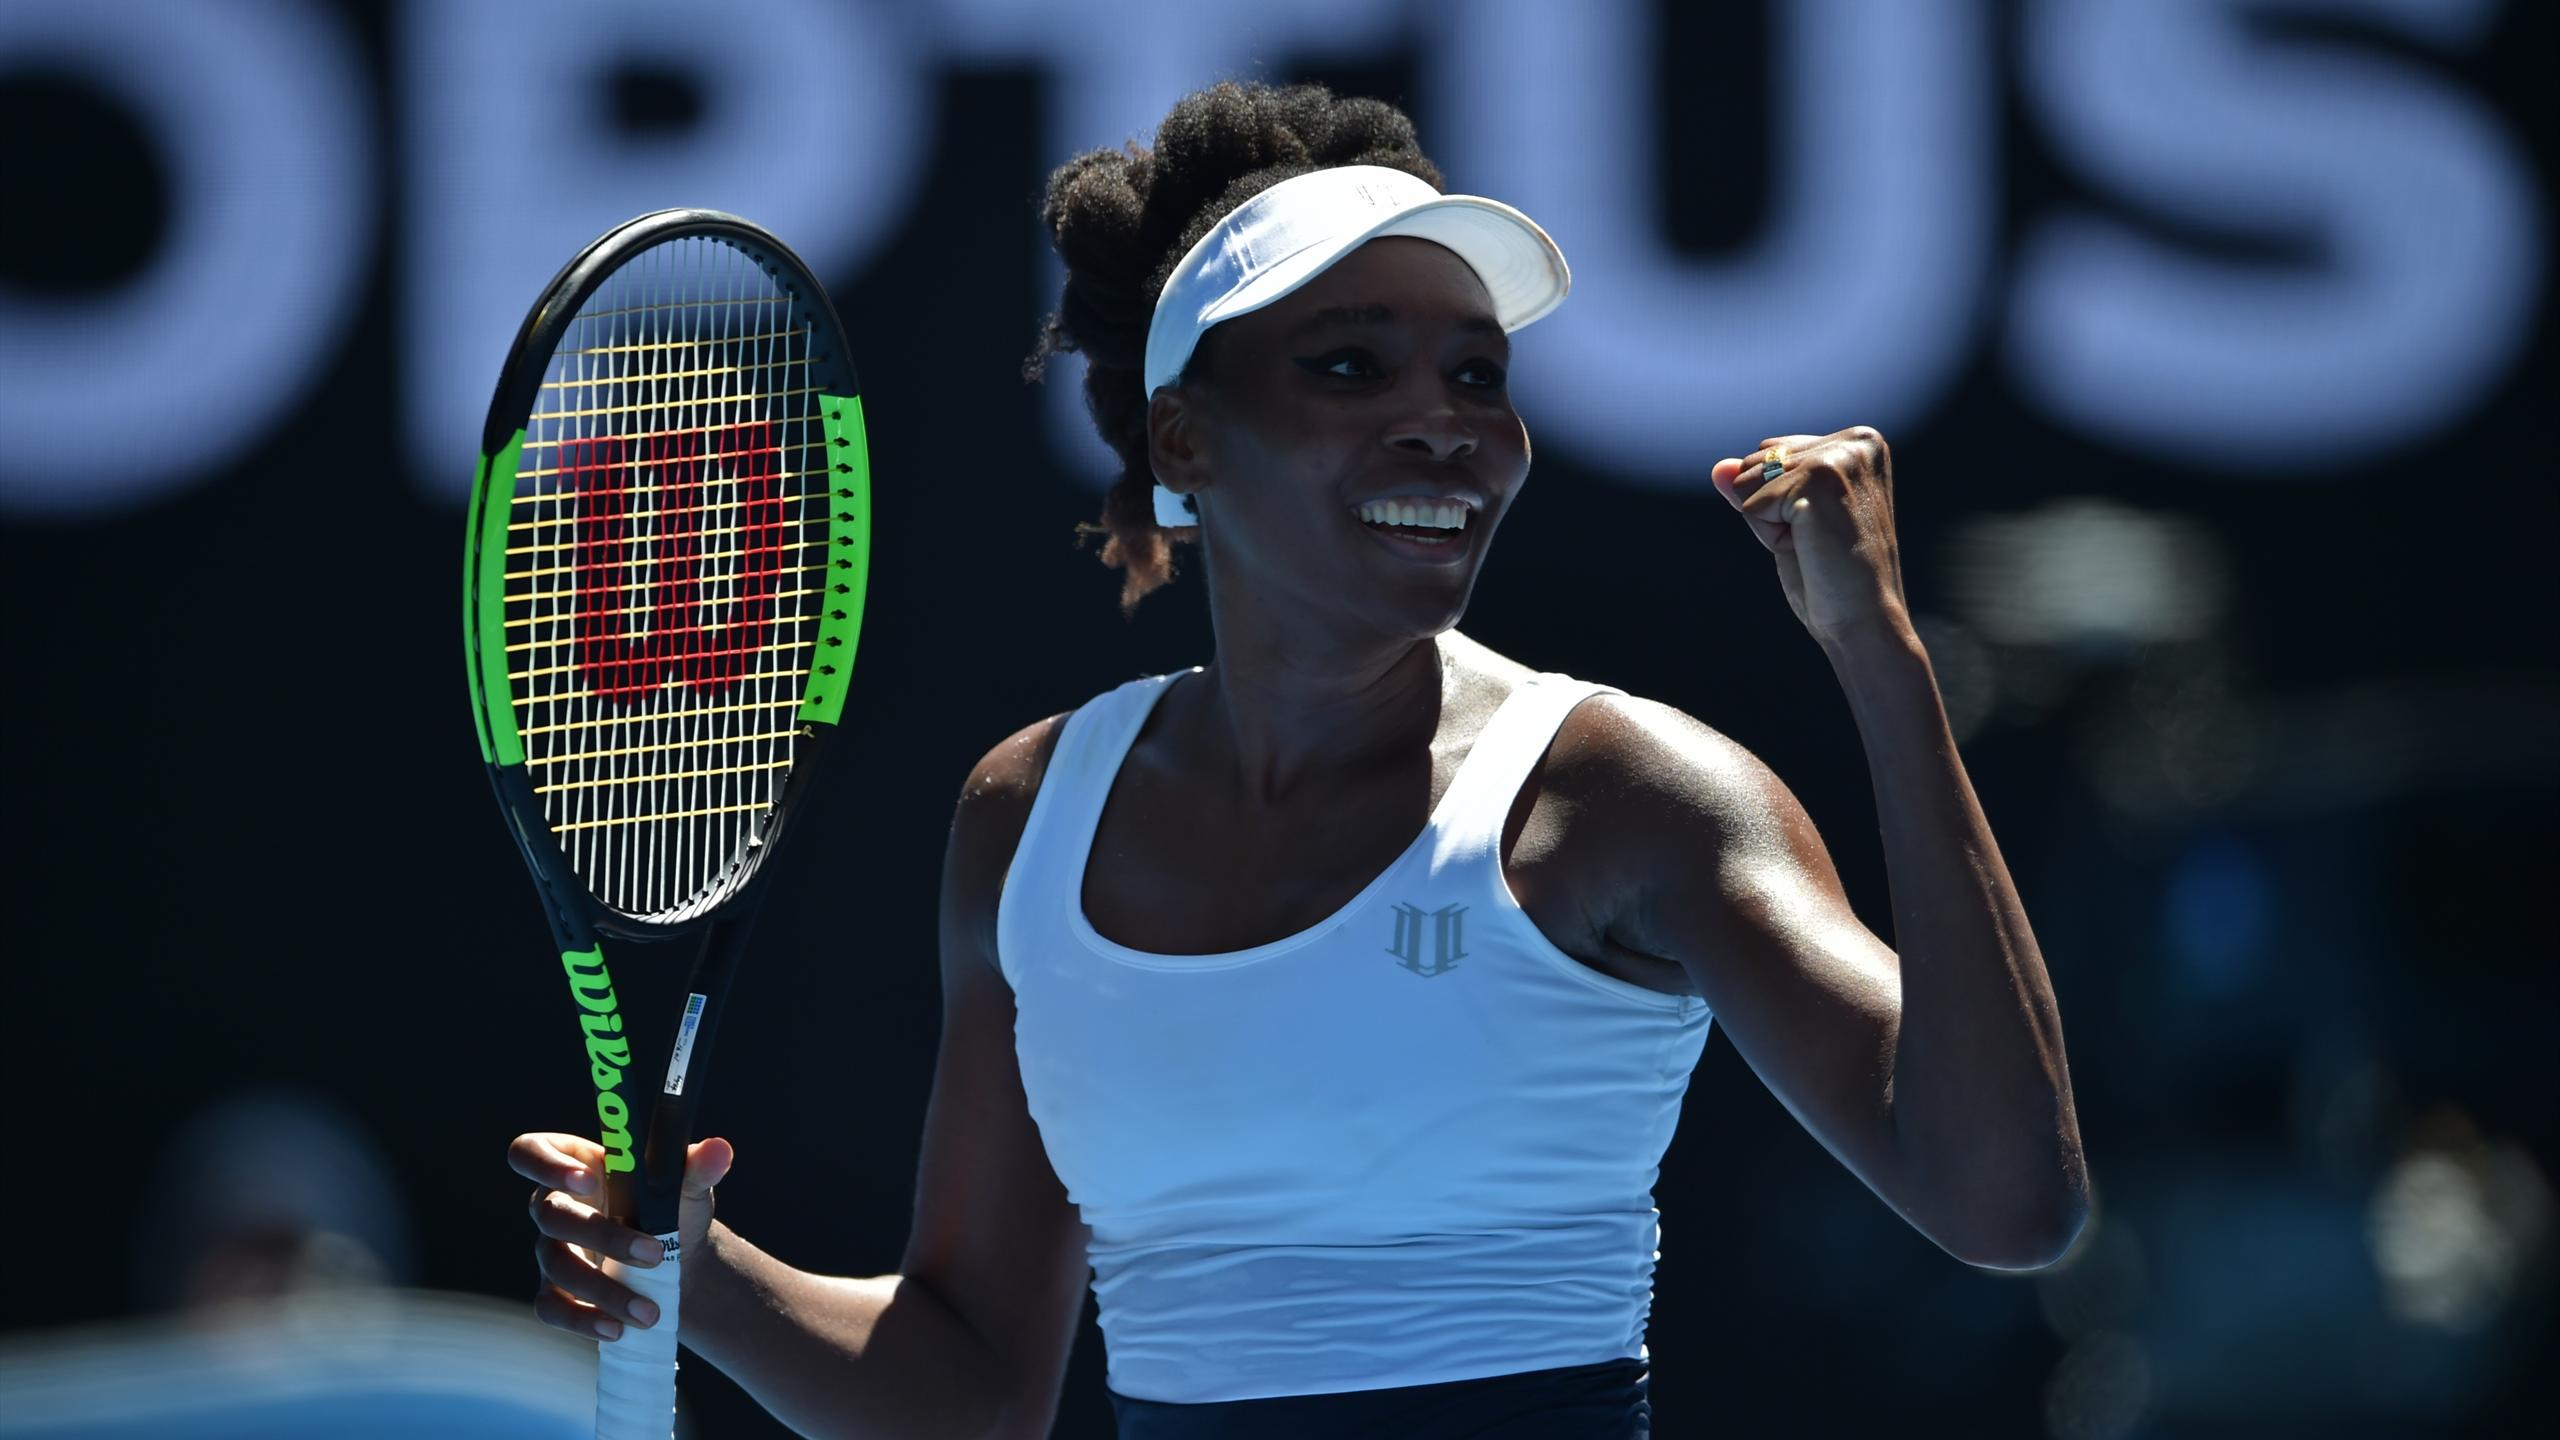 Venus Williams of the US celebrates her victory against Ukraine's Kateryna Kozlova